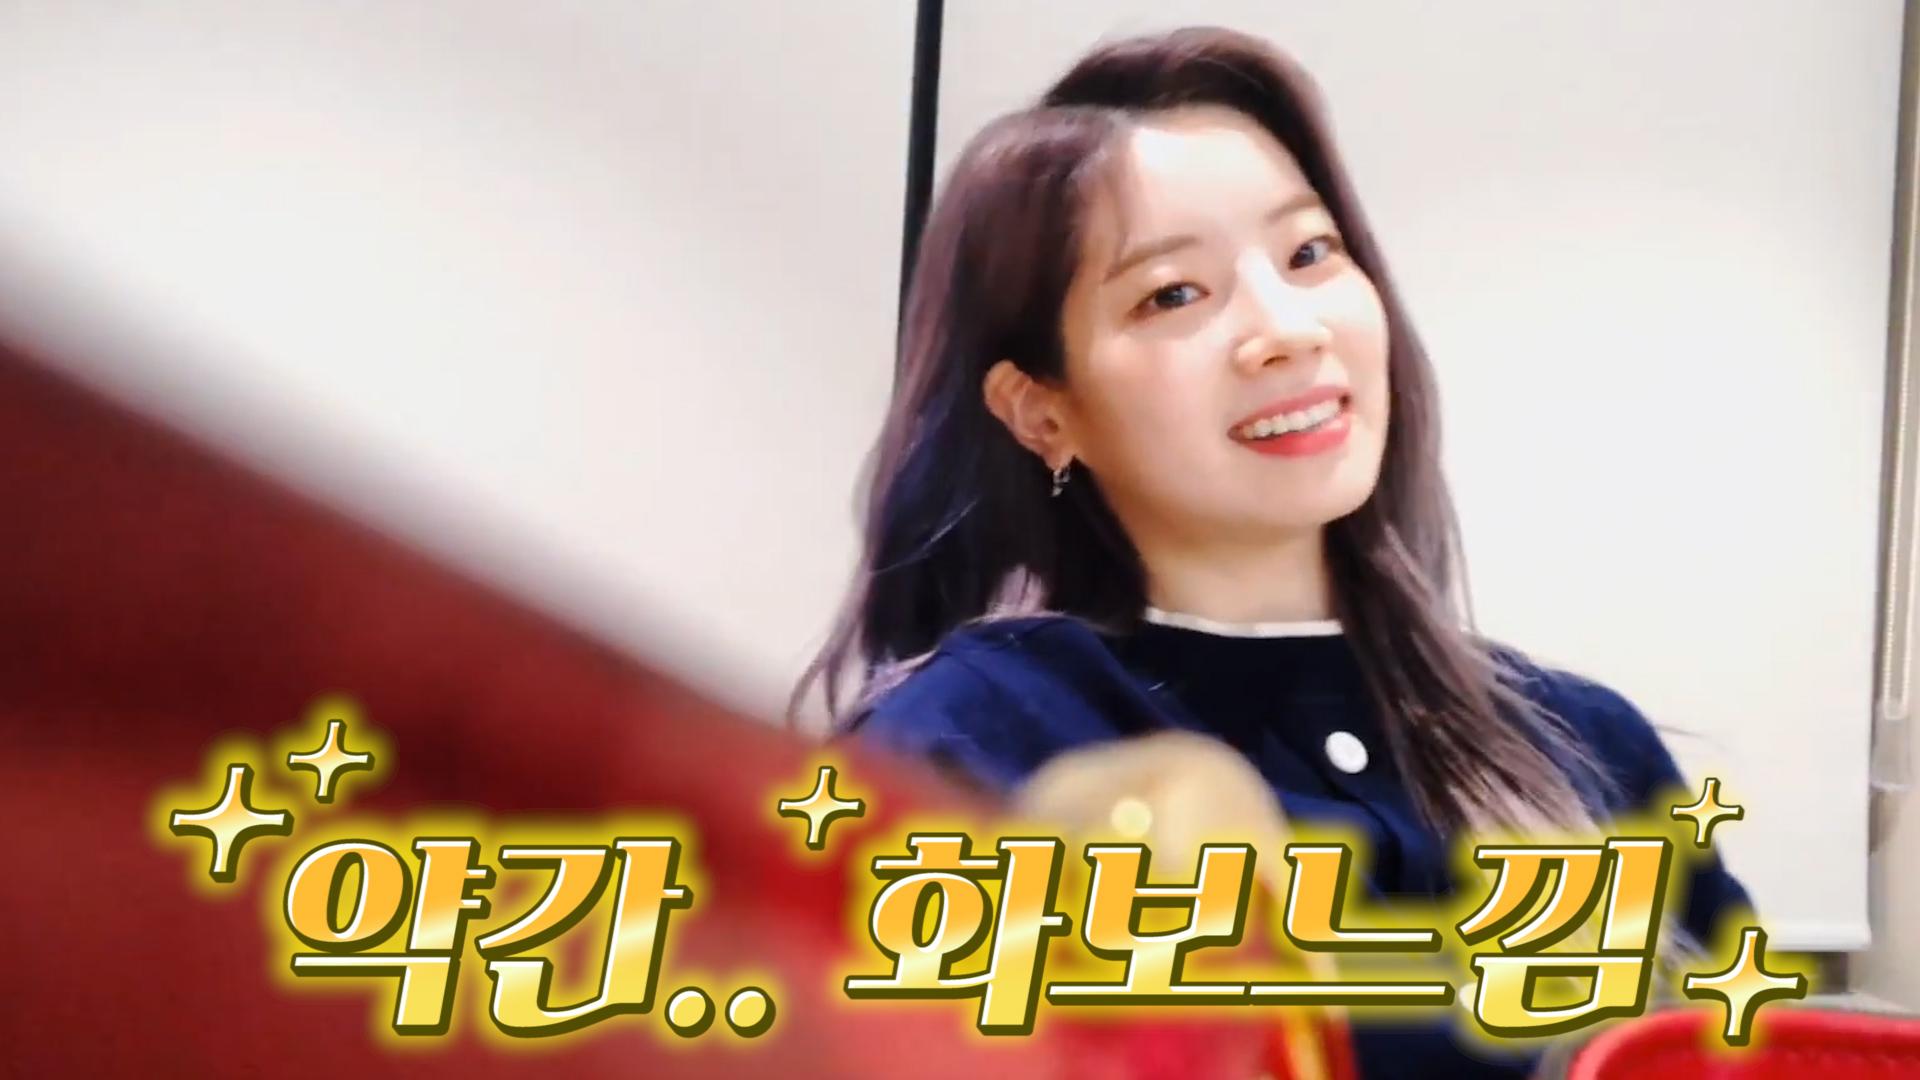 [TWICE] 비나이다.. 우리 둡 트리트먼트길만 걷게 해주세요🙏 (DAHYUN talking about her hairstyle)